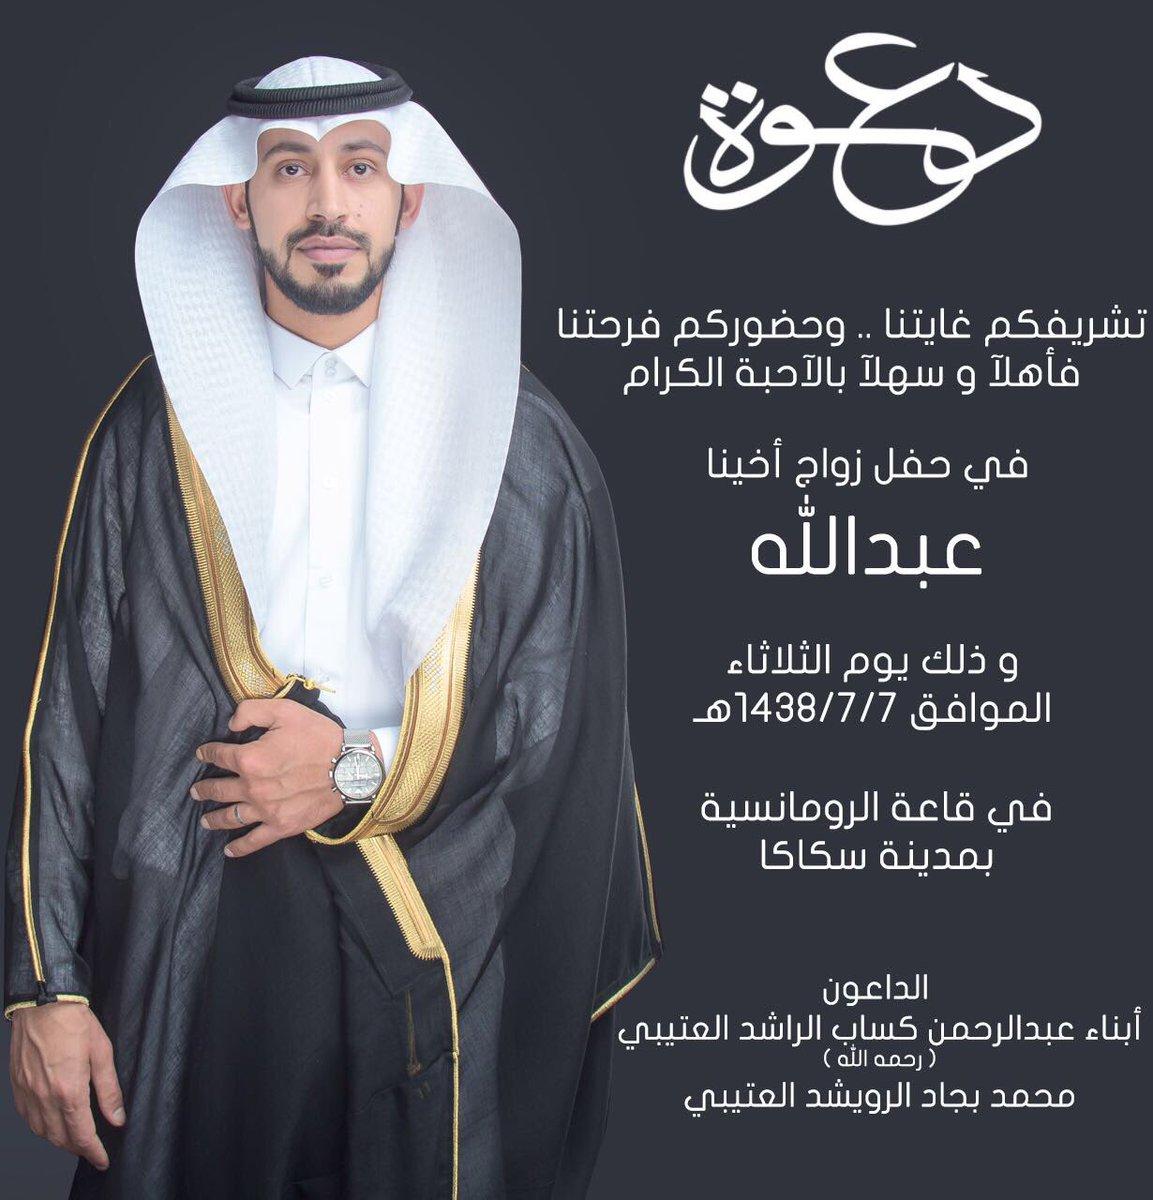 267abfe32 كساب العتيبي on Twitter: